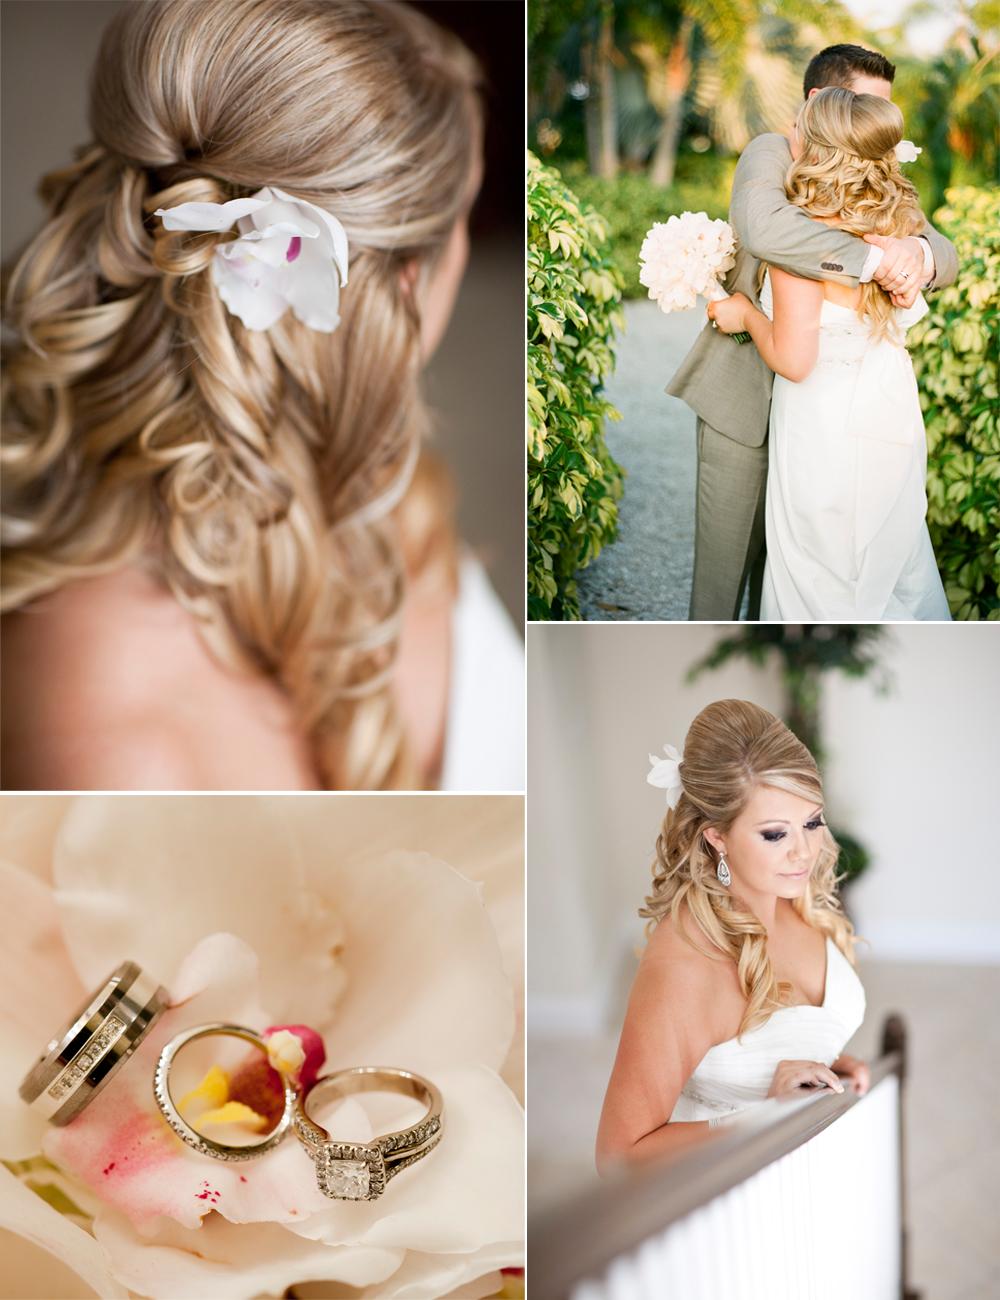 Half Up Wedding Hairstyle Real Weddings Summer Beach Theme Half Up Wedding Wedding Hair Inspiration Half Up Wedding Hair